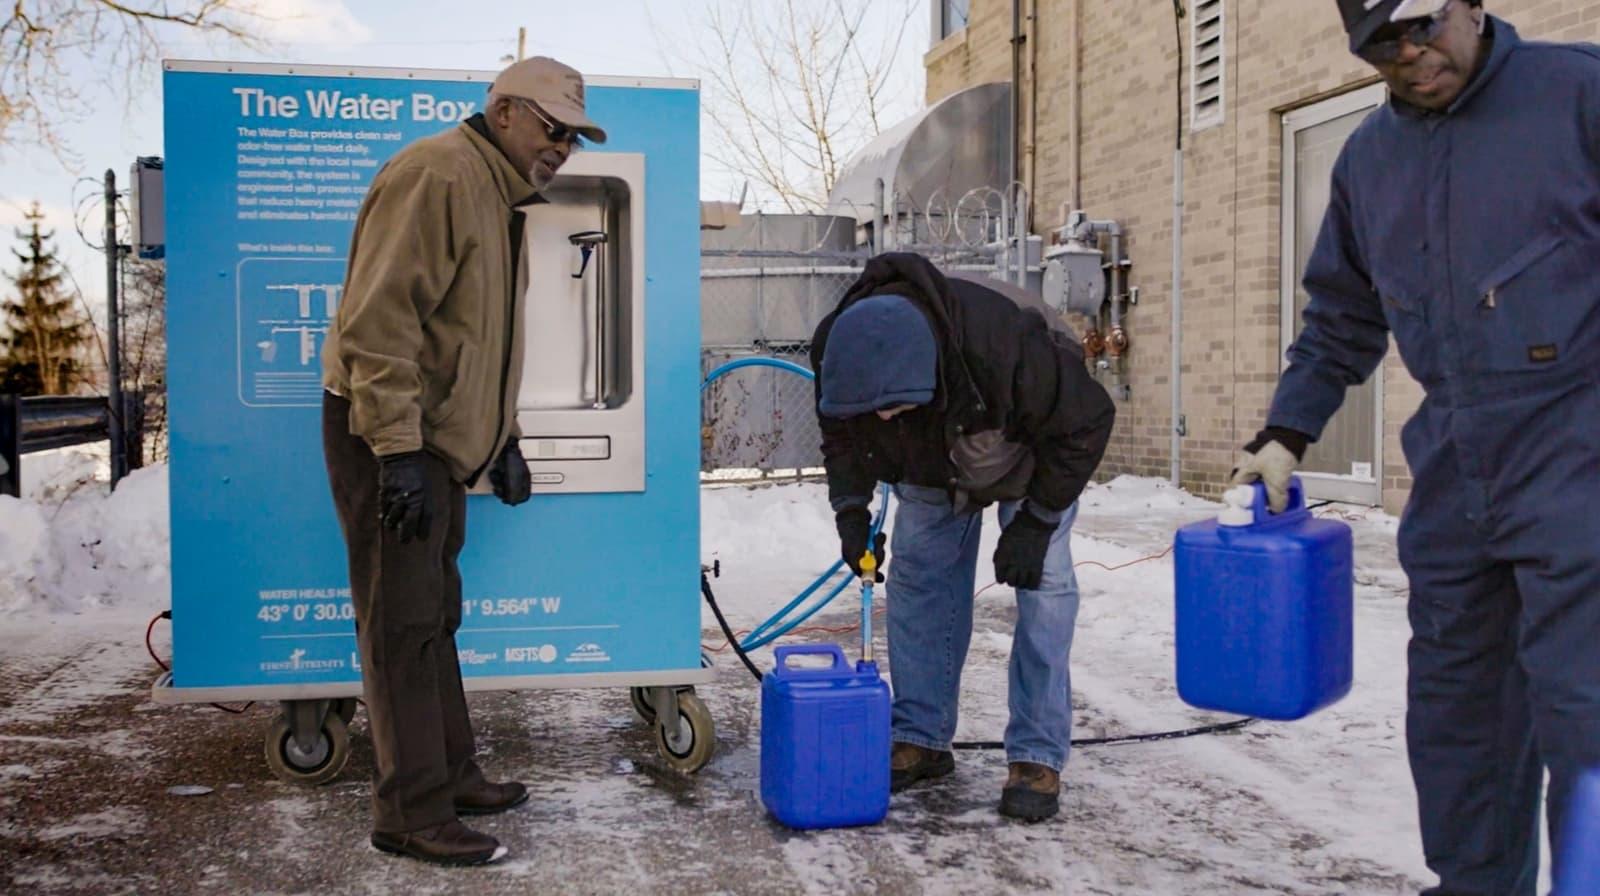 Jaden Smith bringing clean water to Flint